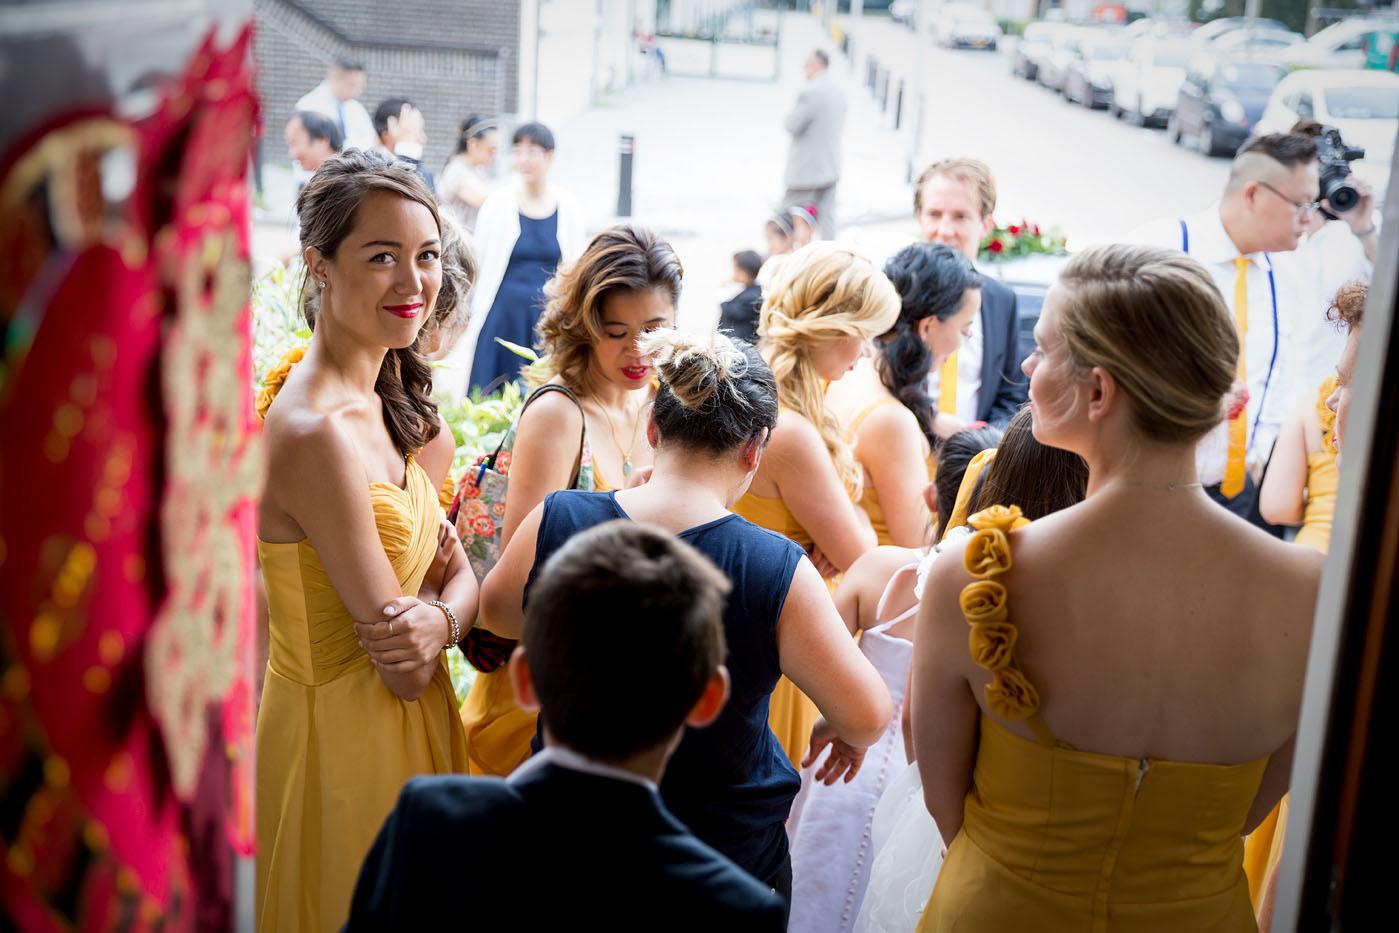 bruiloft-wedding-trouwen-fotograaf-chinees-bobhersbach-rotterdam-gezellig